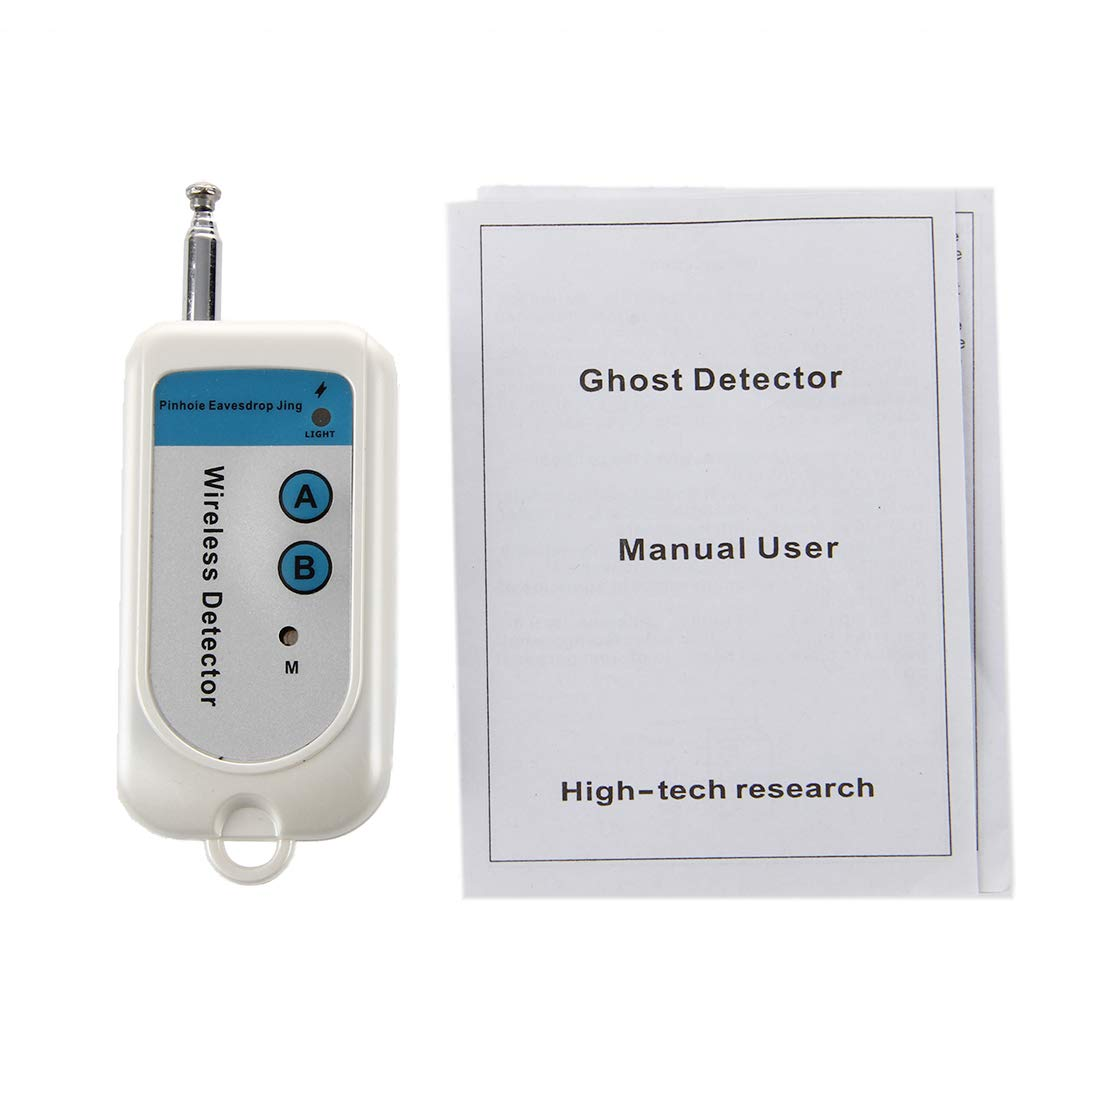 SODIAL(R) Detector Camara con Microfono Oculto Contra Espionaje: Amazon.es: Electrónica